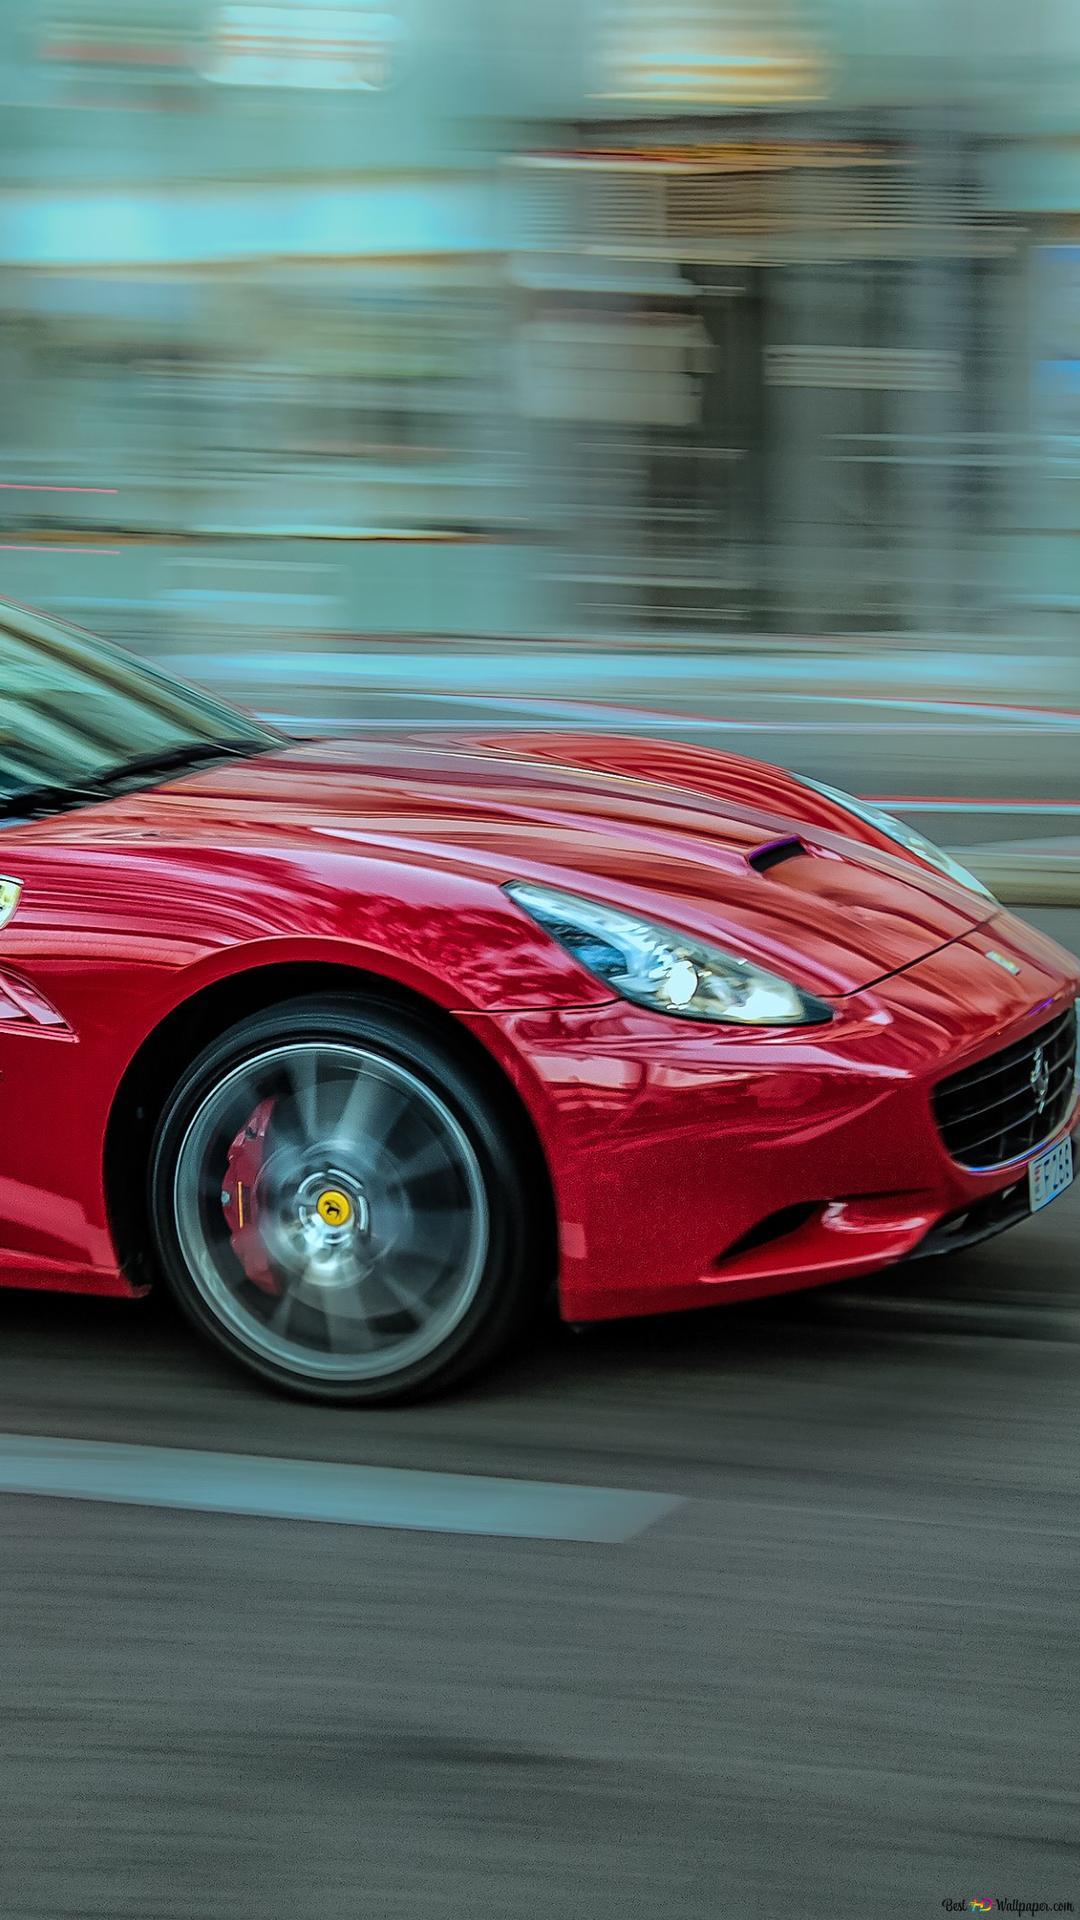 Red Ferrari Hd Wallpaper Download